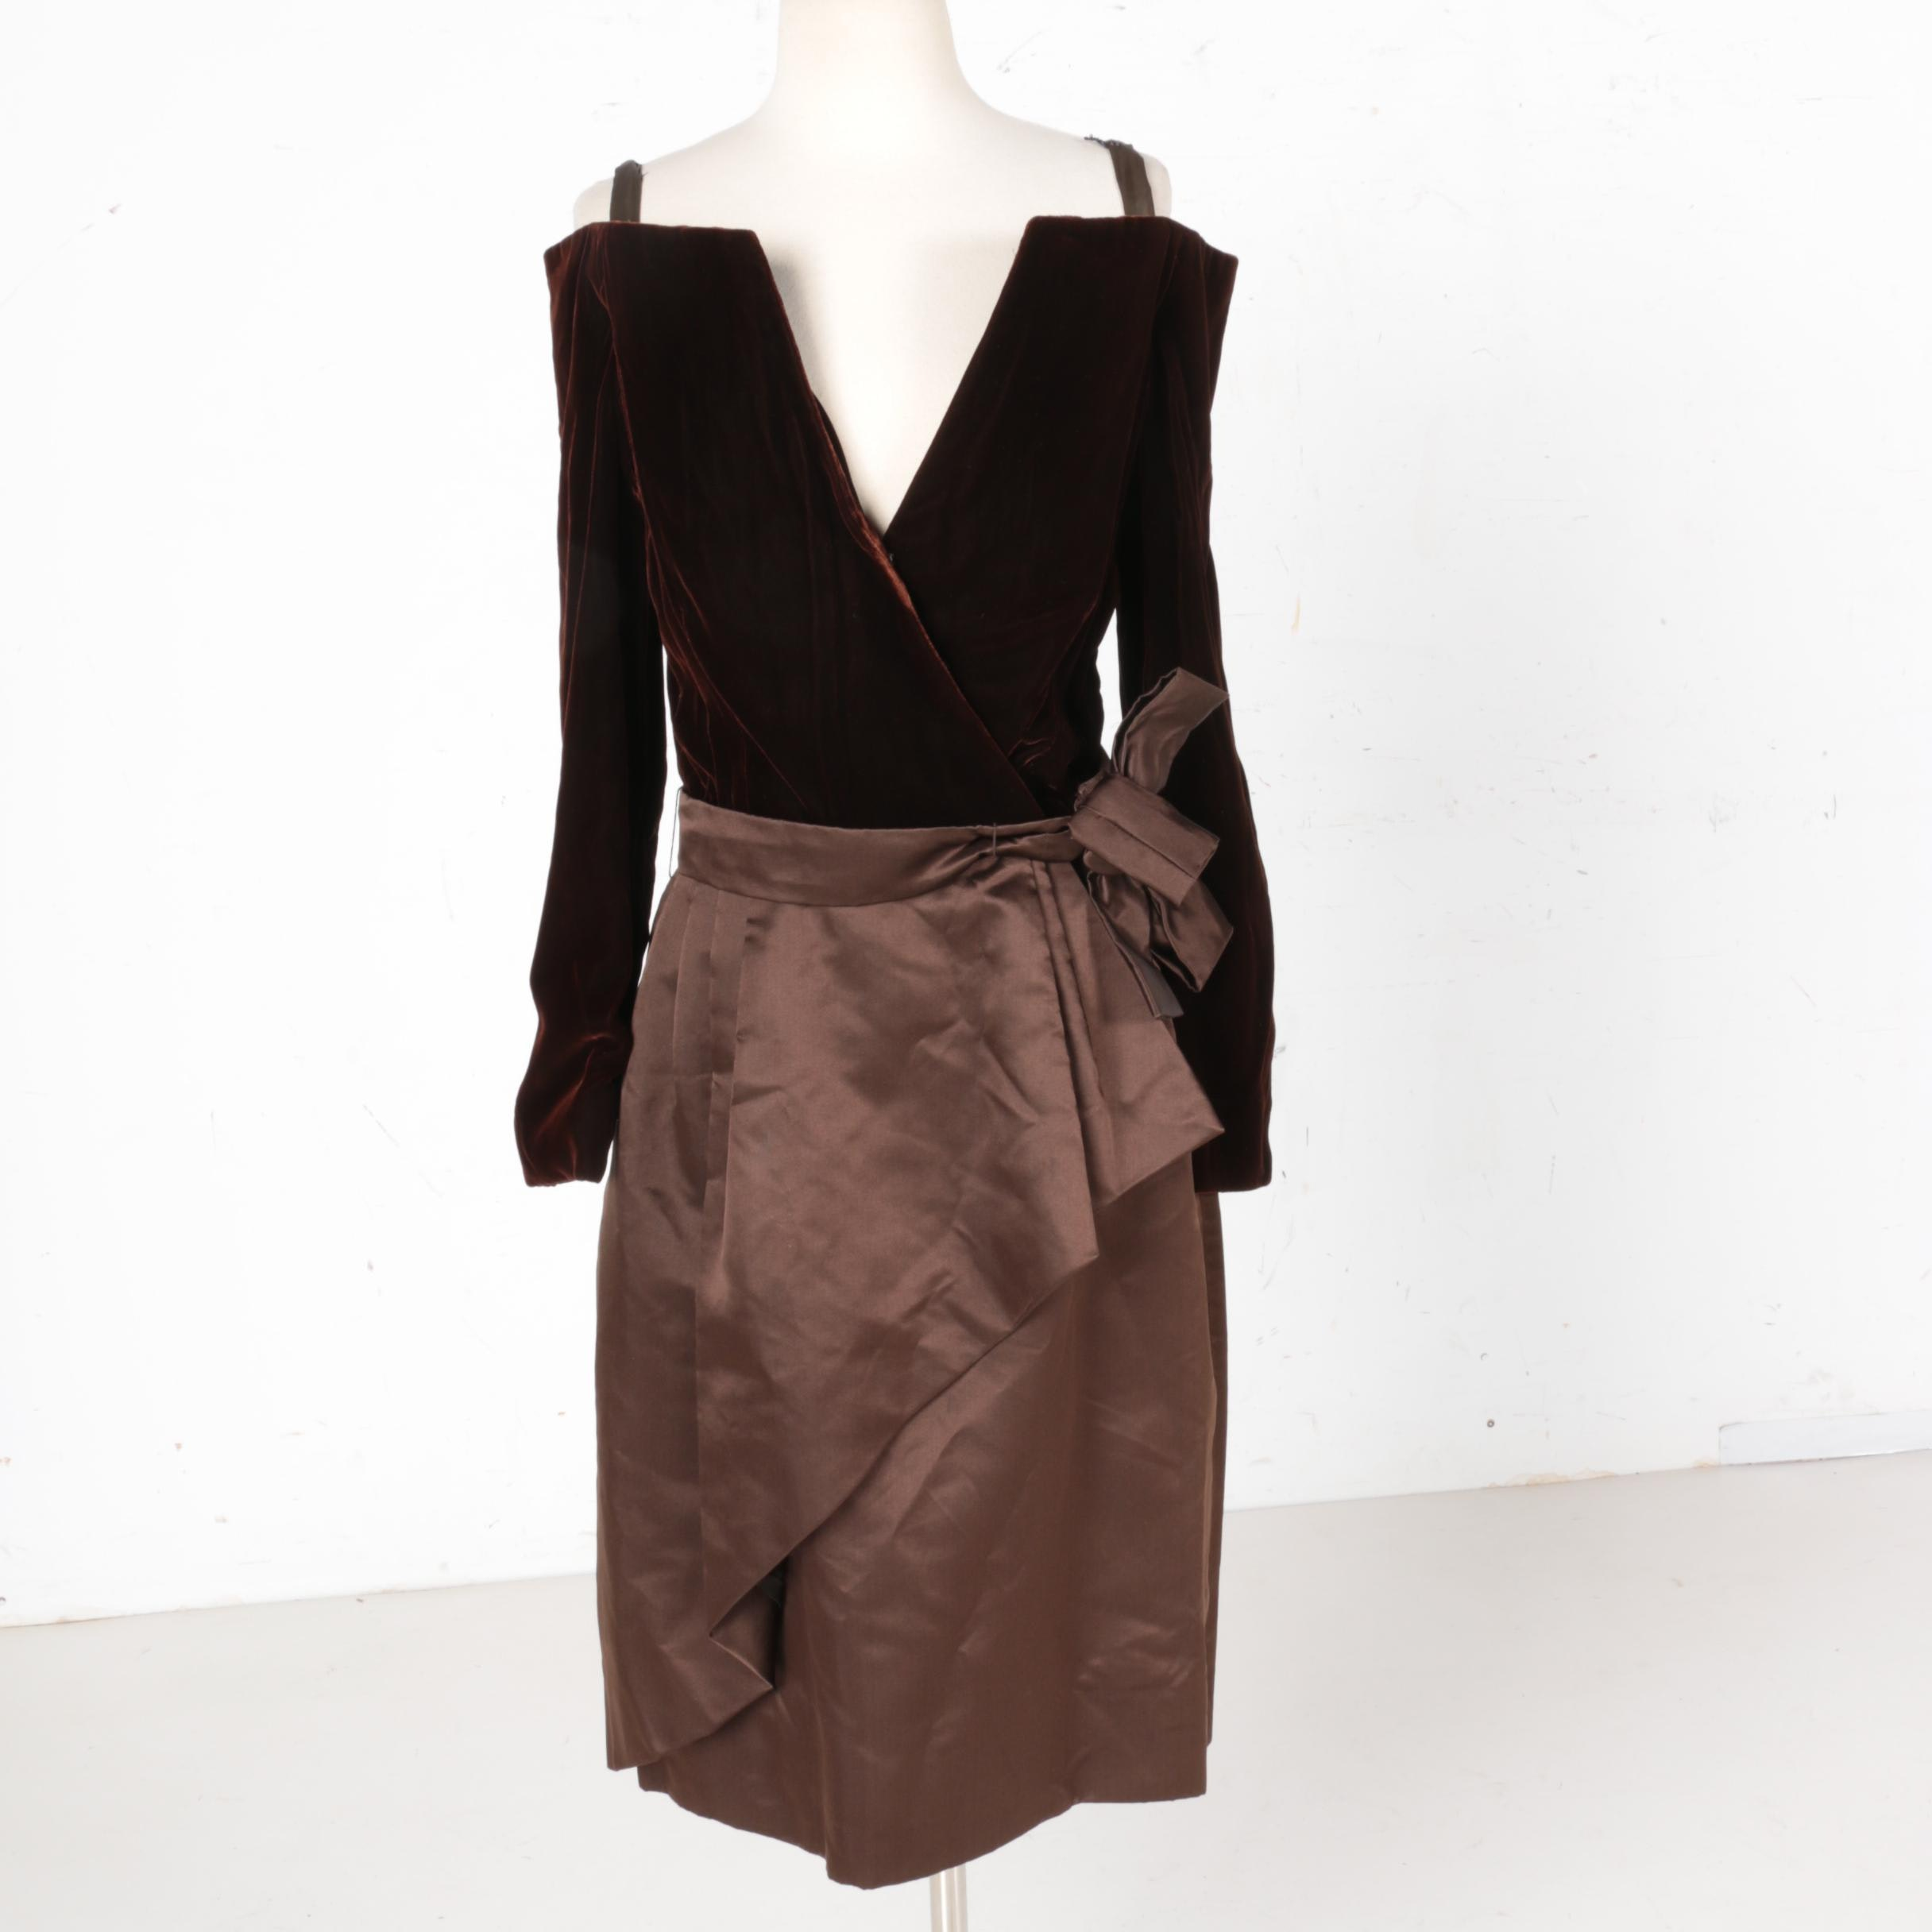 Vintage 1970s Scaasi Boutique Evening Dress